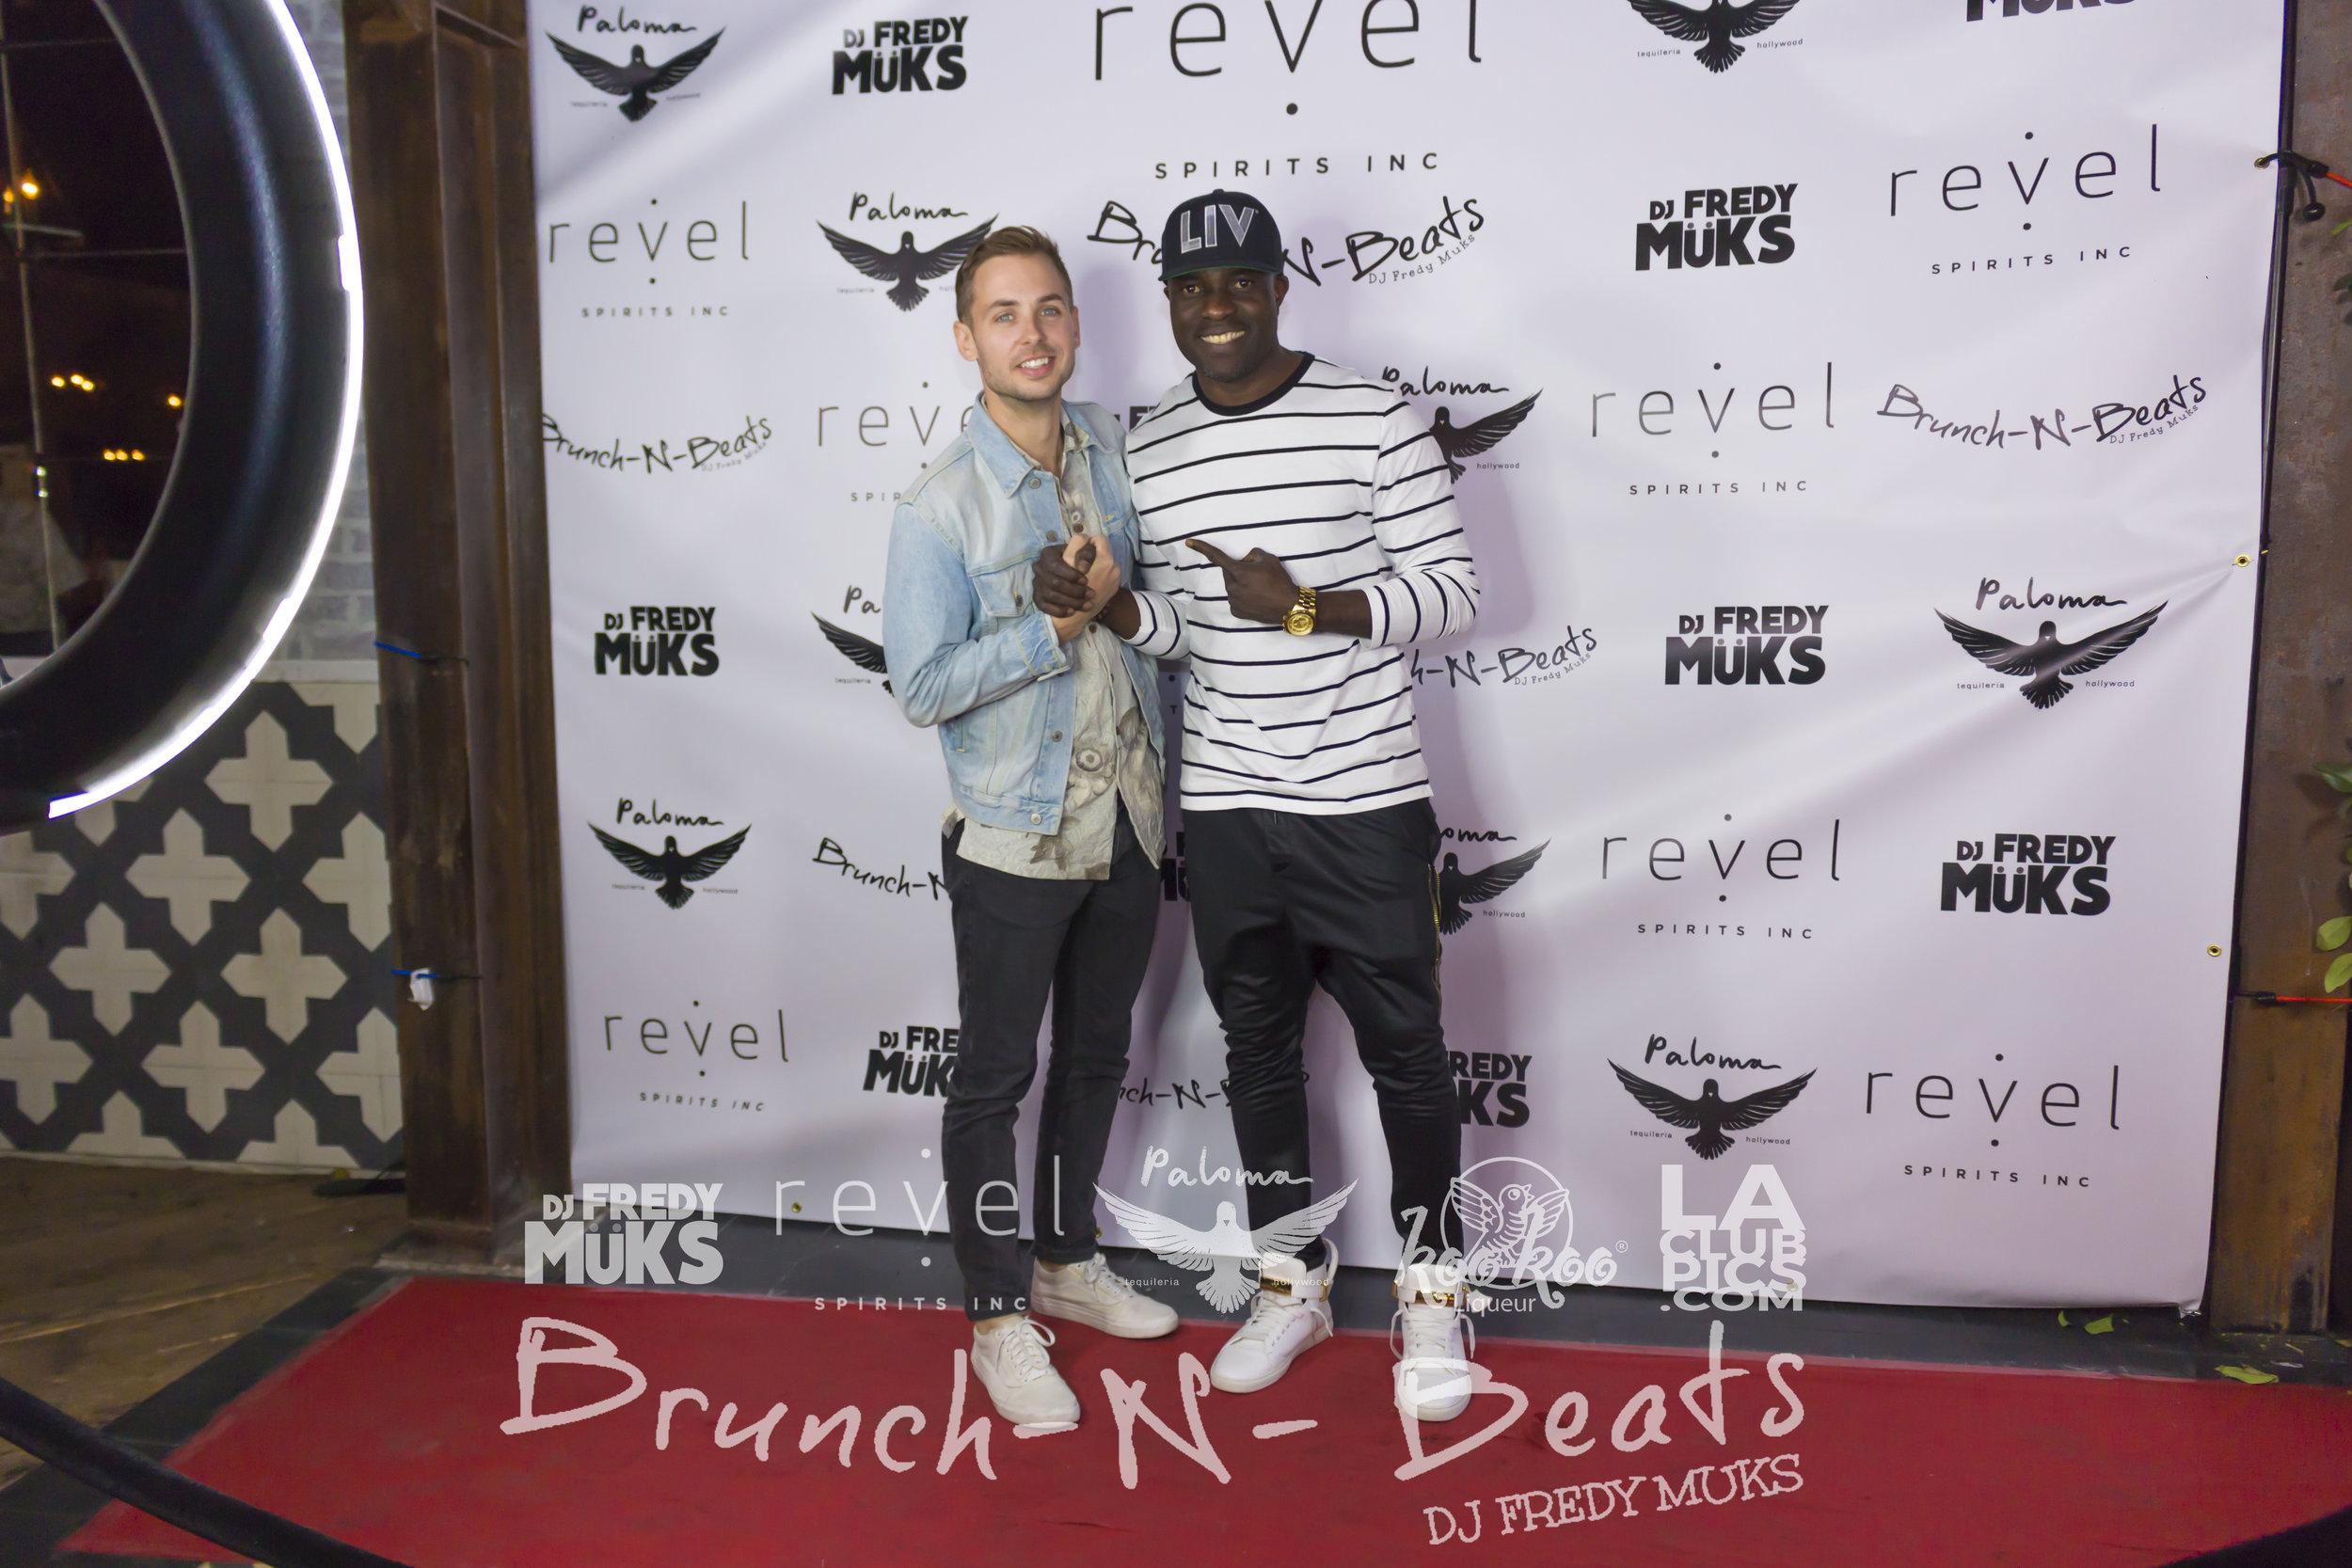 Brunch-N-Beats - Paloma Hollywood - 02-25-18_185.jpg